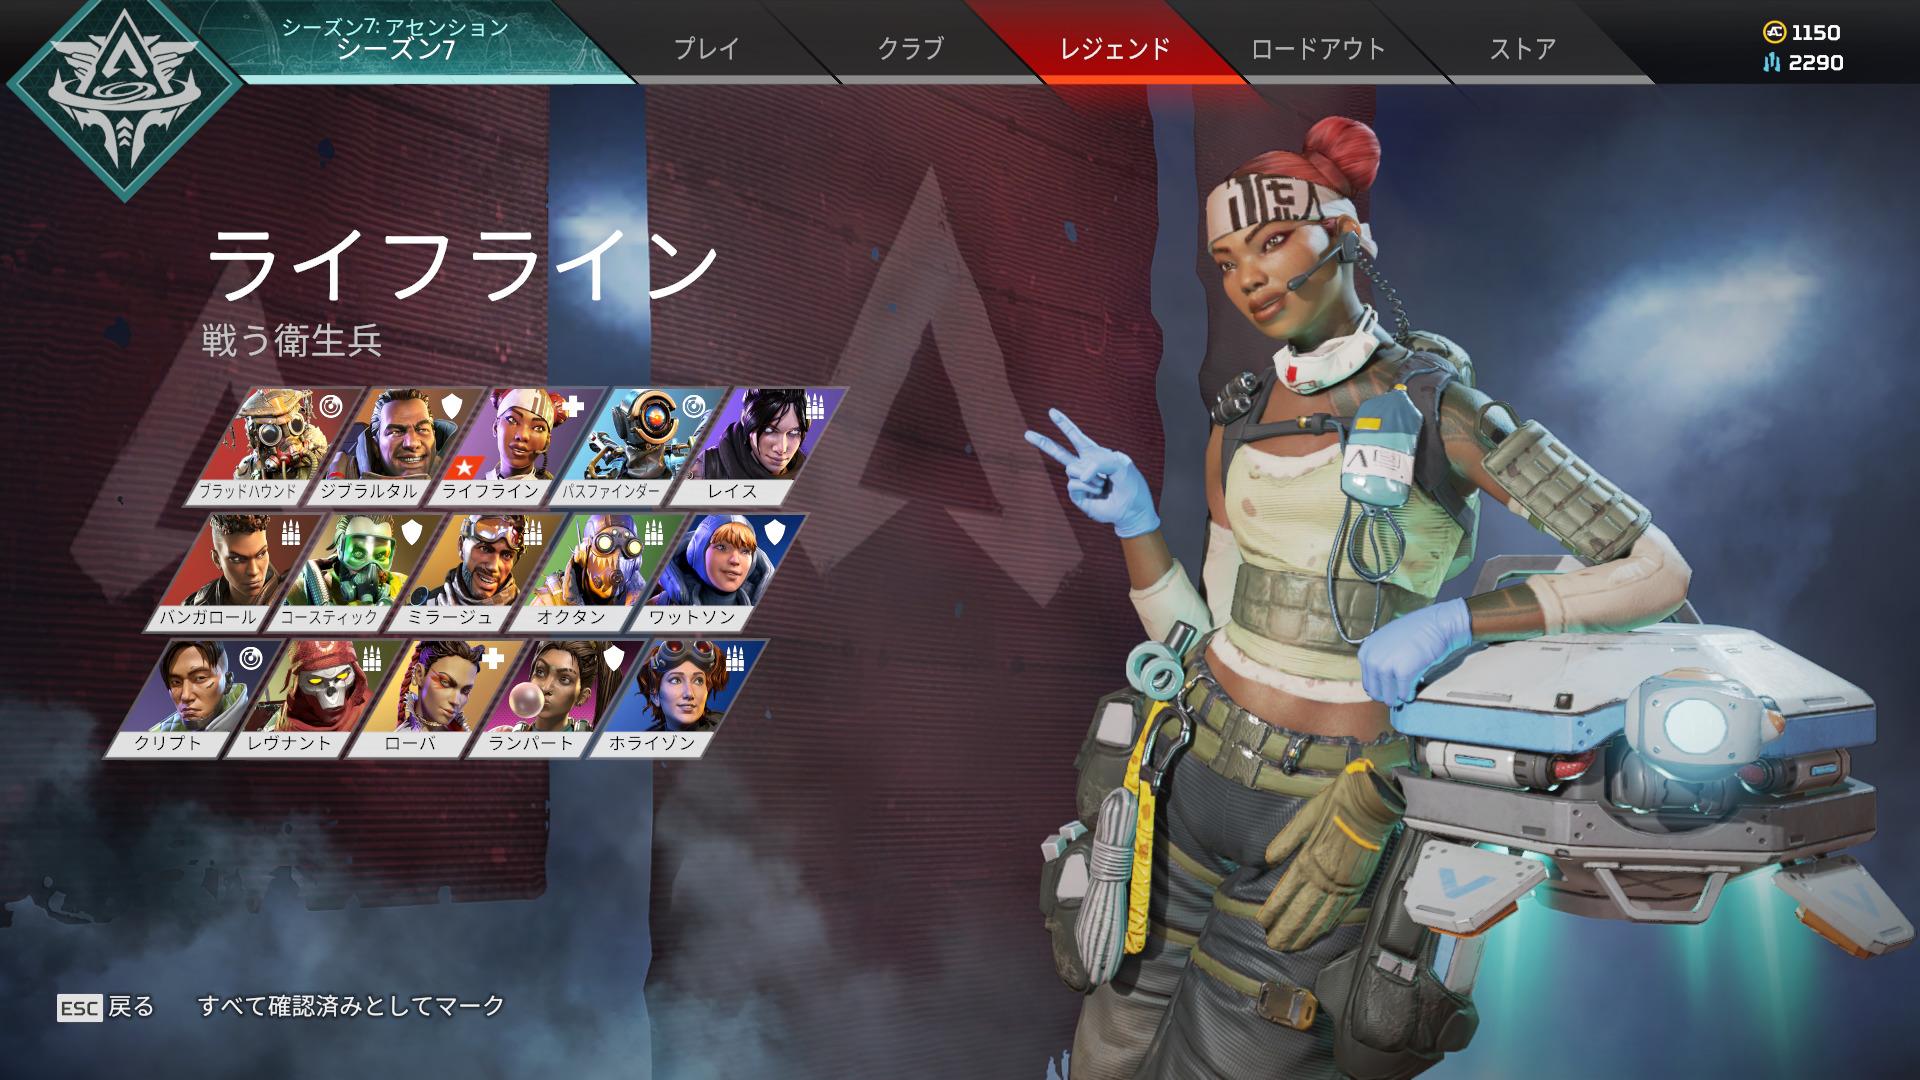 【Apex Legends】ライフライン 日本語セリフ一覧【基本ボイス】【エーペックスレジェンズ】